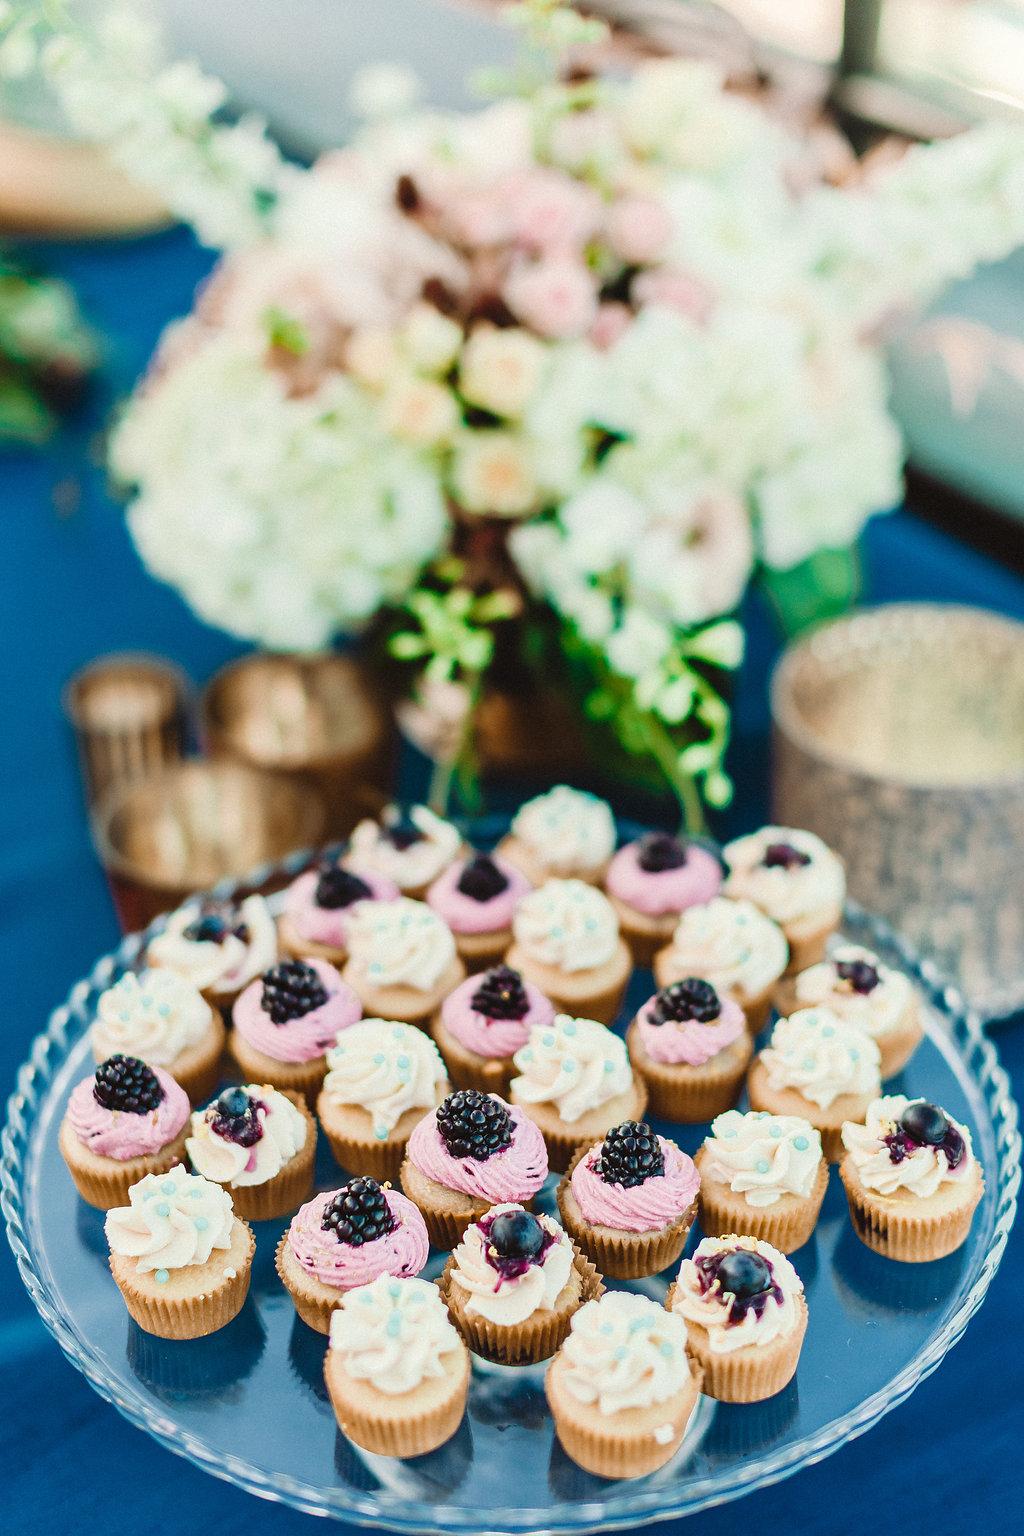 www.santabarbarawedding.com | Rewind Photography | Santa Barbara Maritime Museum | Dessert